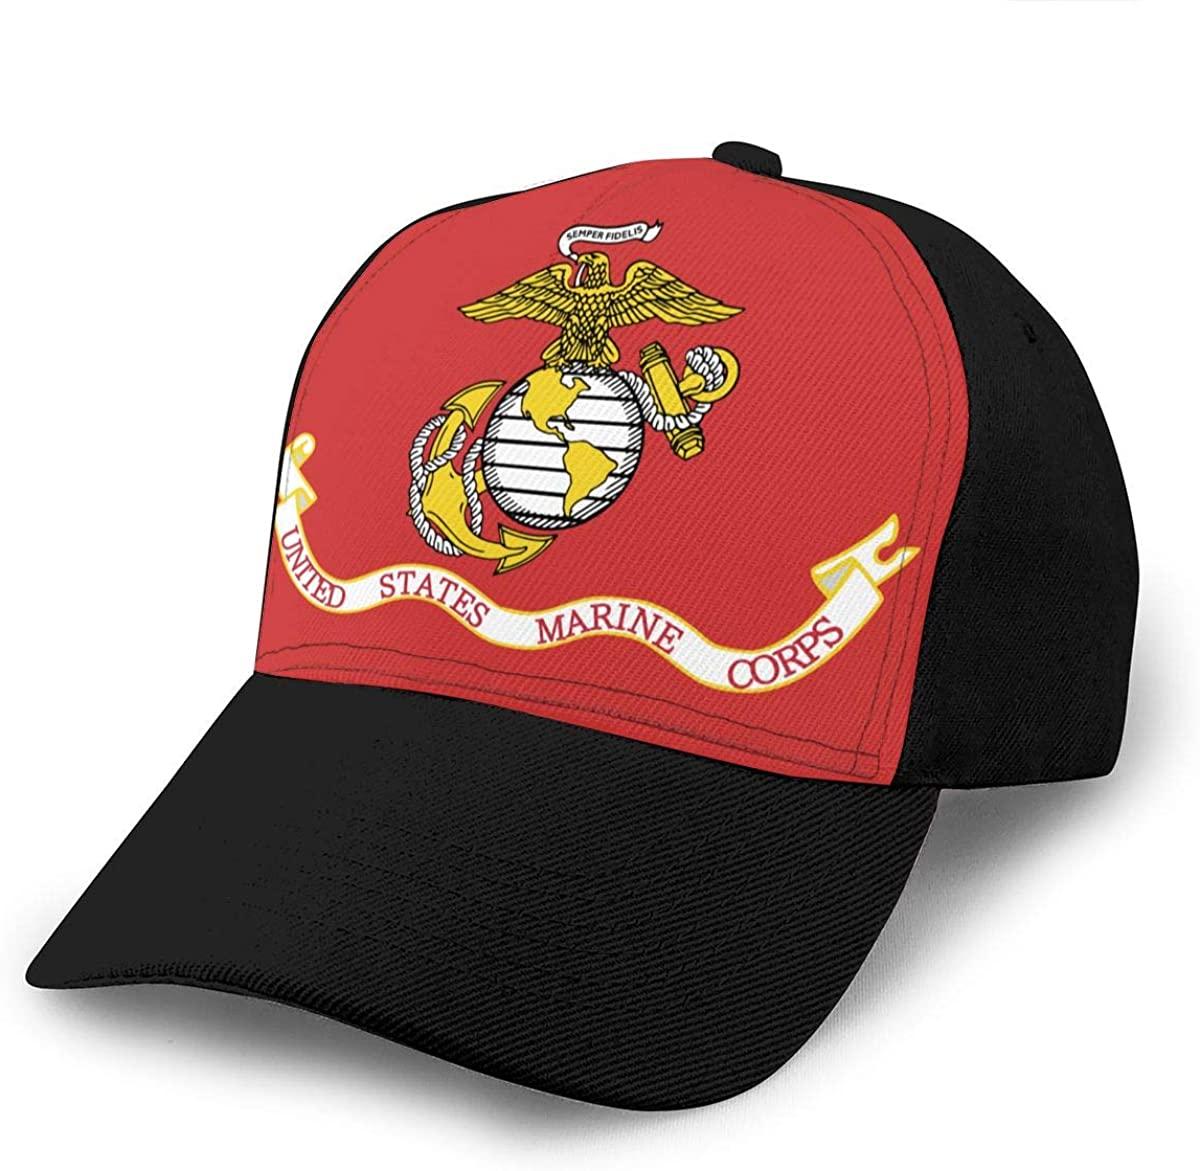 Baseball Cap Cool Cat Kitten Adjustable Anti UV Sun Hat Washed Cotton Outdoor Dad Hat for Men Women